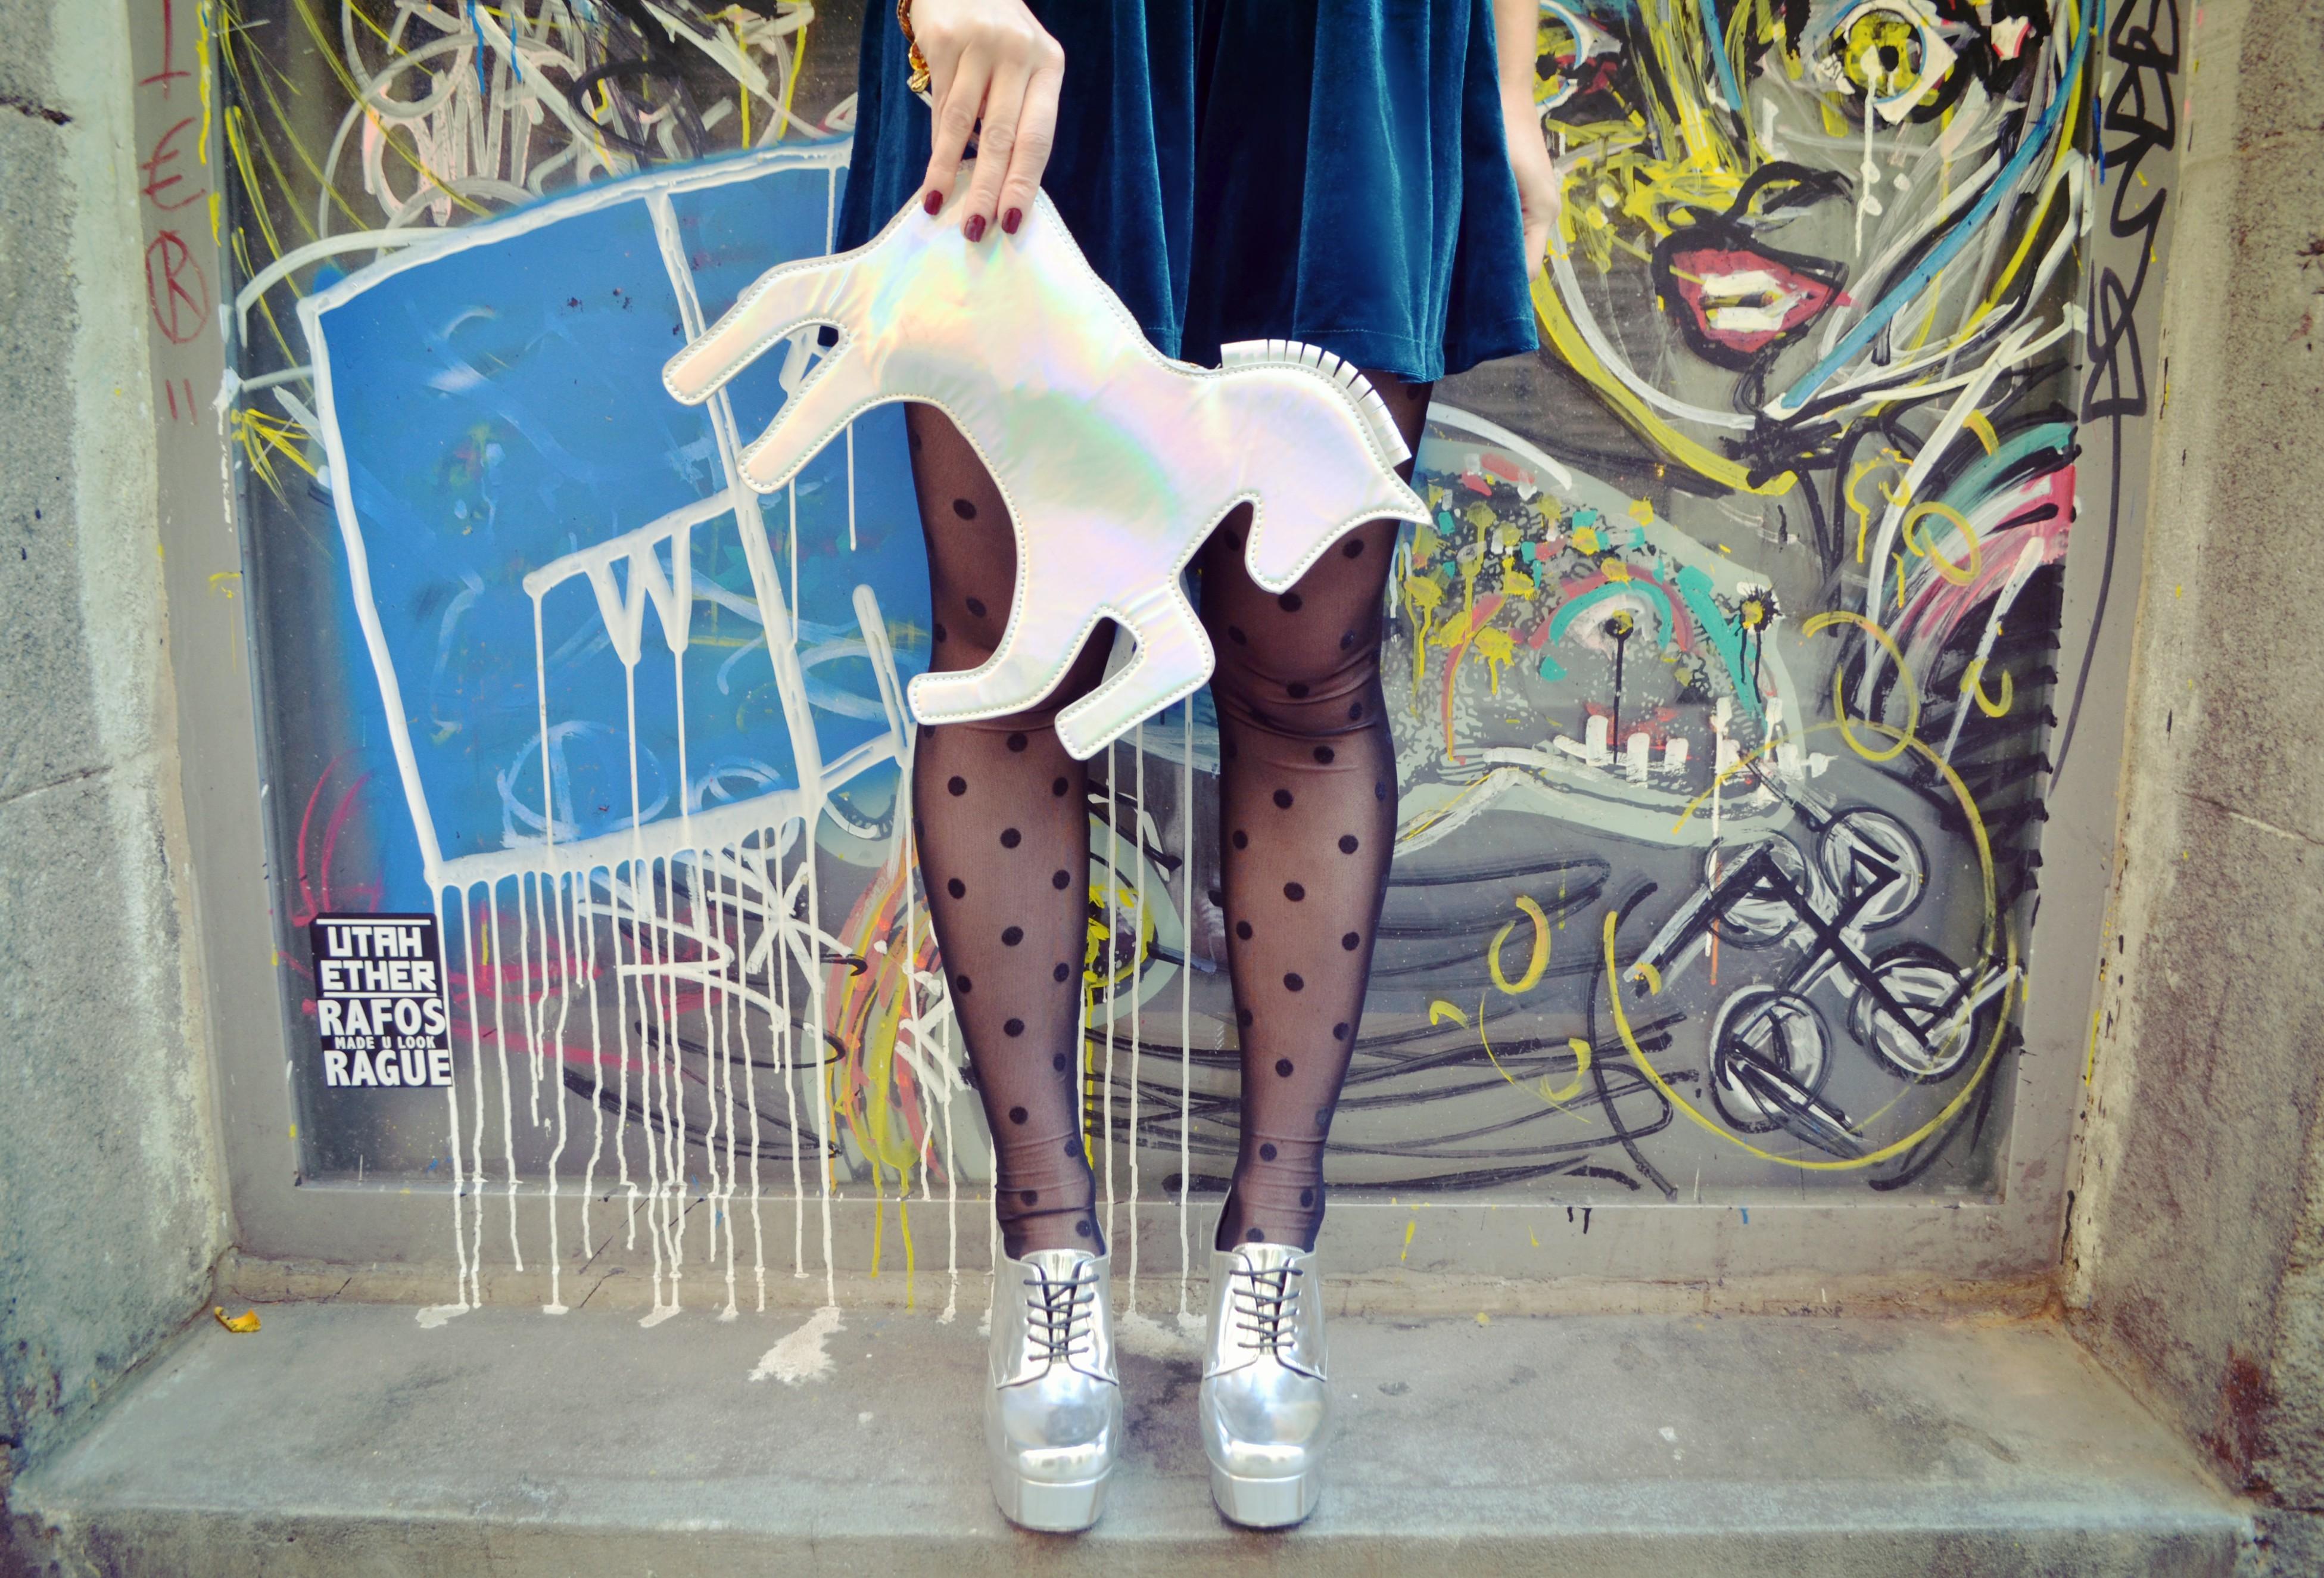 Blog-de-moda-ChicAdicta-fashionista-Chic-Adicta-medias-de-lunares-polkadot-tights-romwe-jumpsuit-velvet-style-PiensaenChic-Piensa-en-Chic